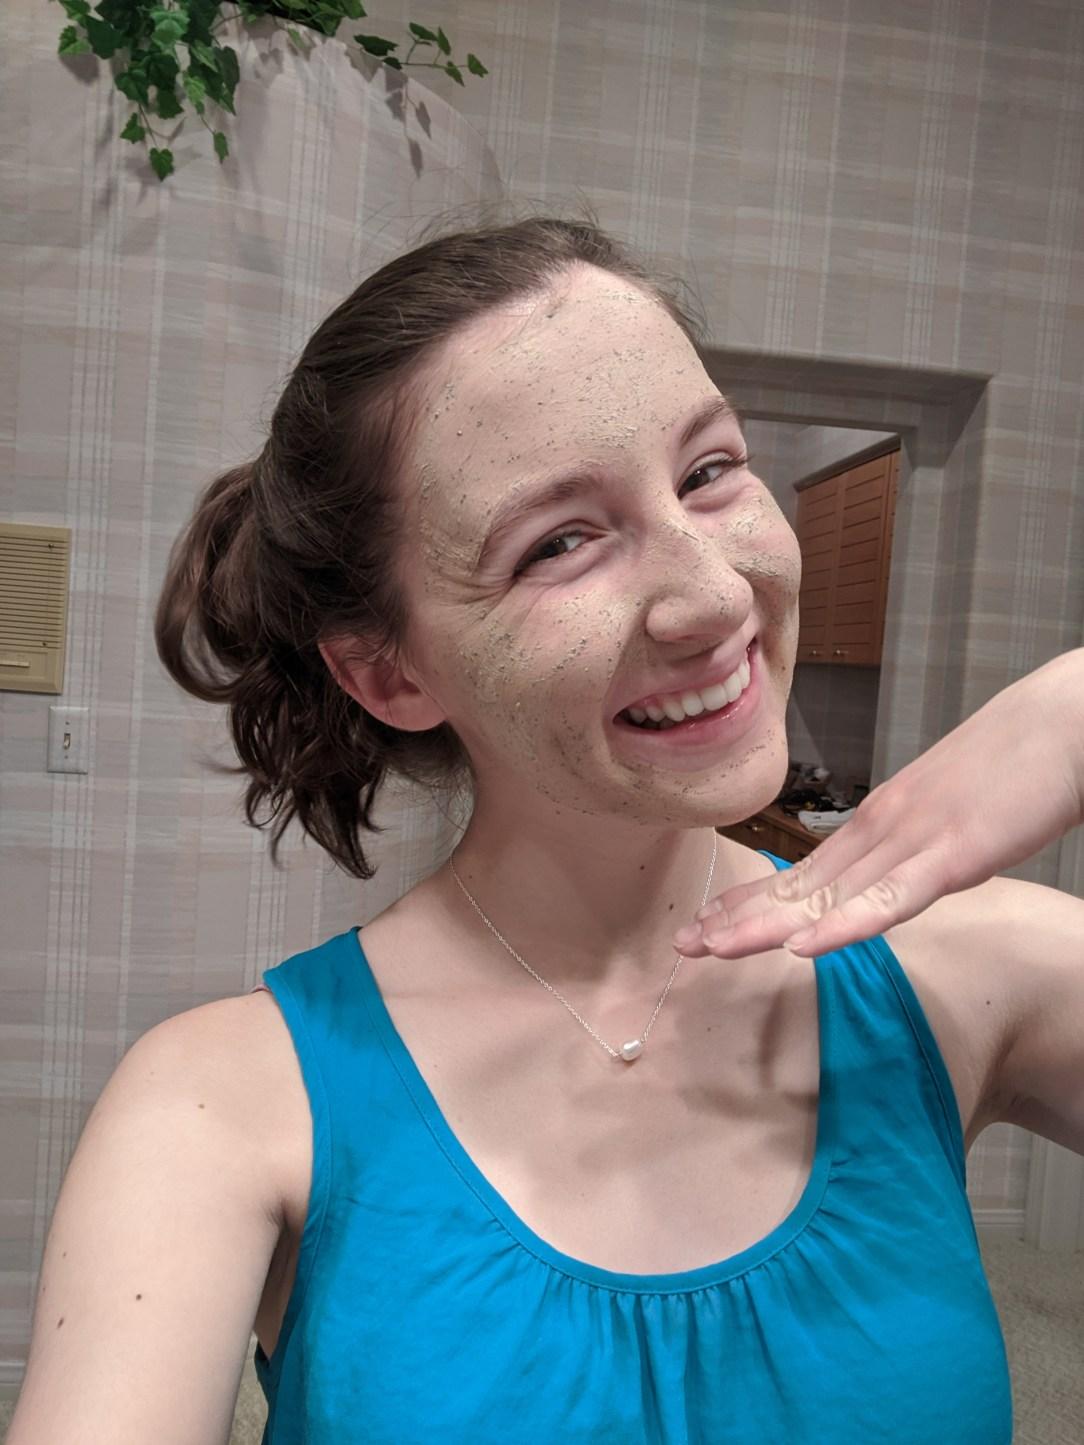 face-mask-spa-night-quarantine-activities